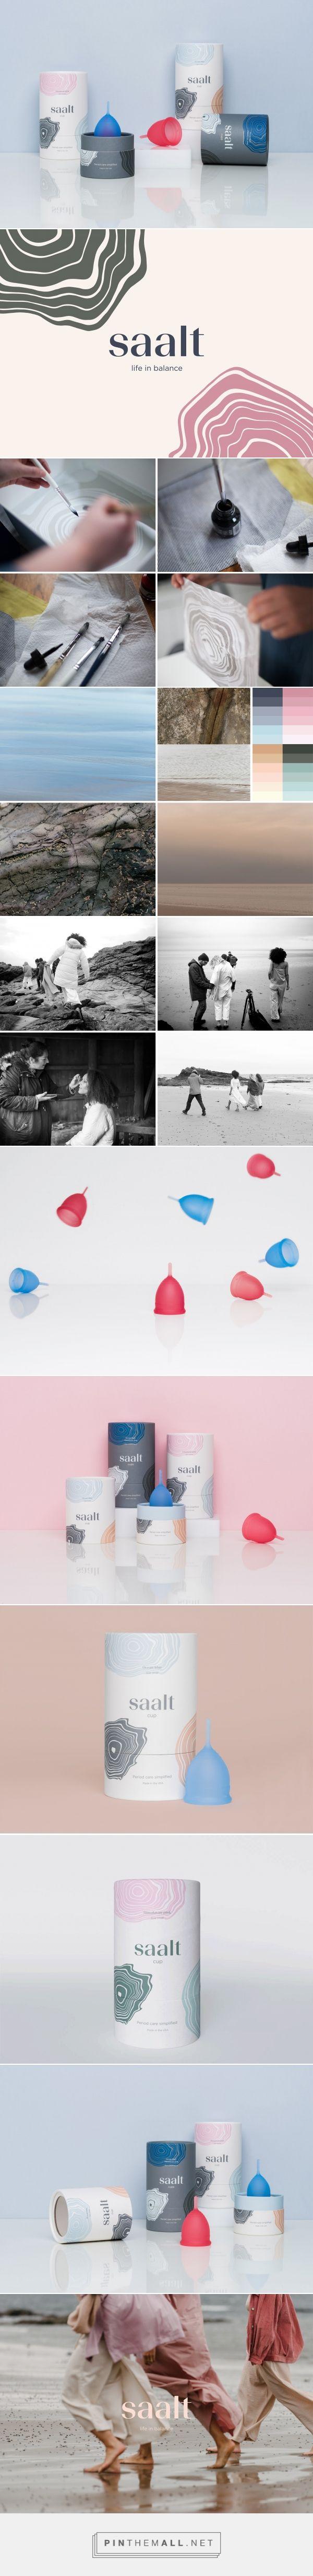 7 Best Logos Images On Pinterest Brand Identity